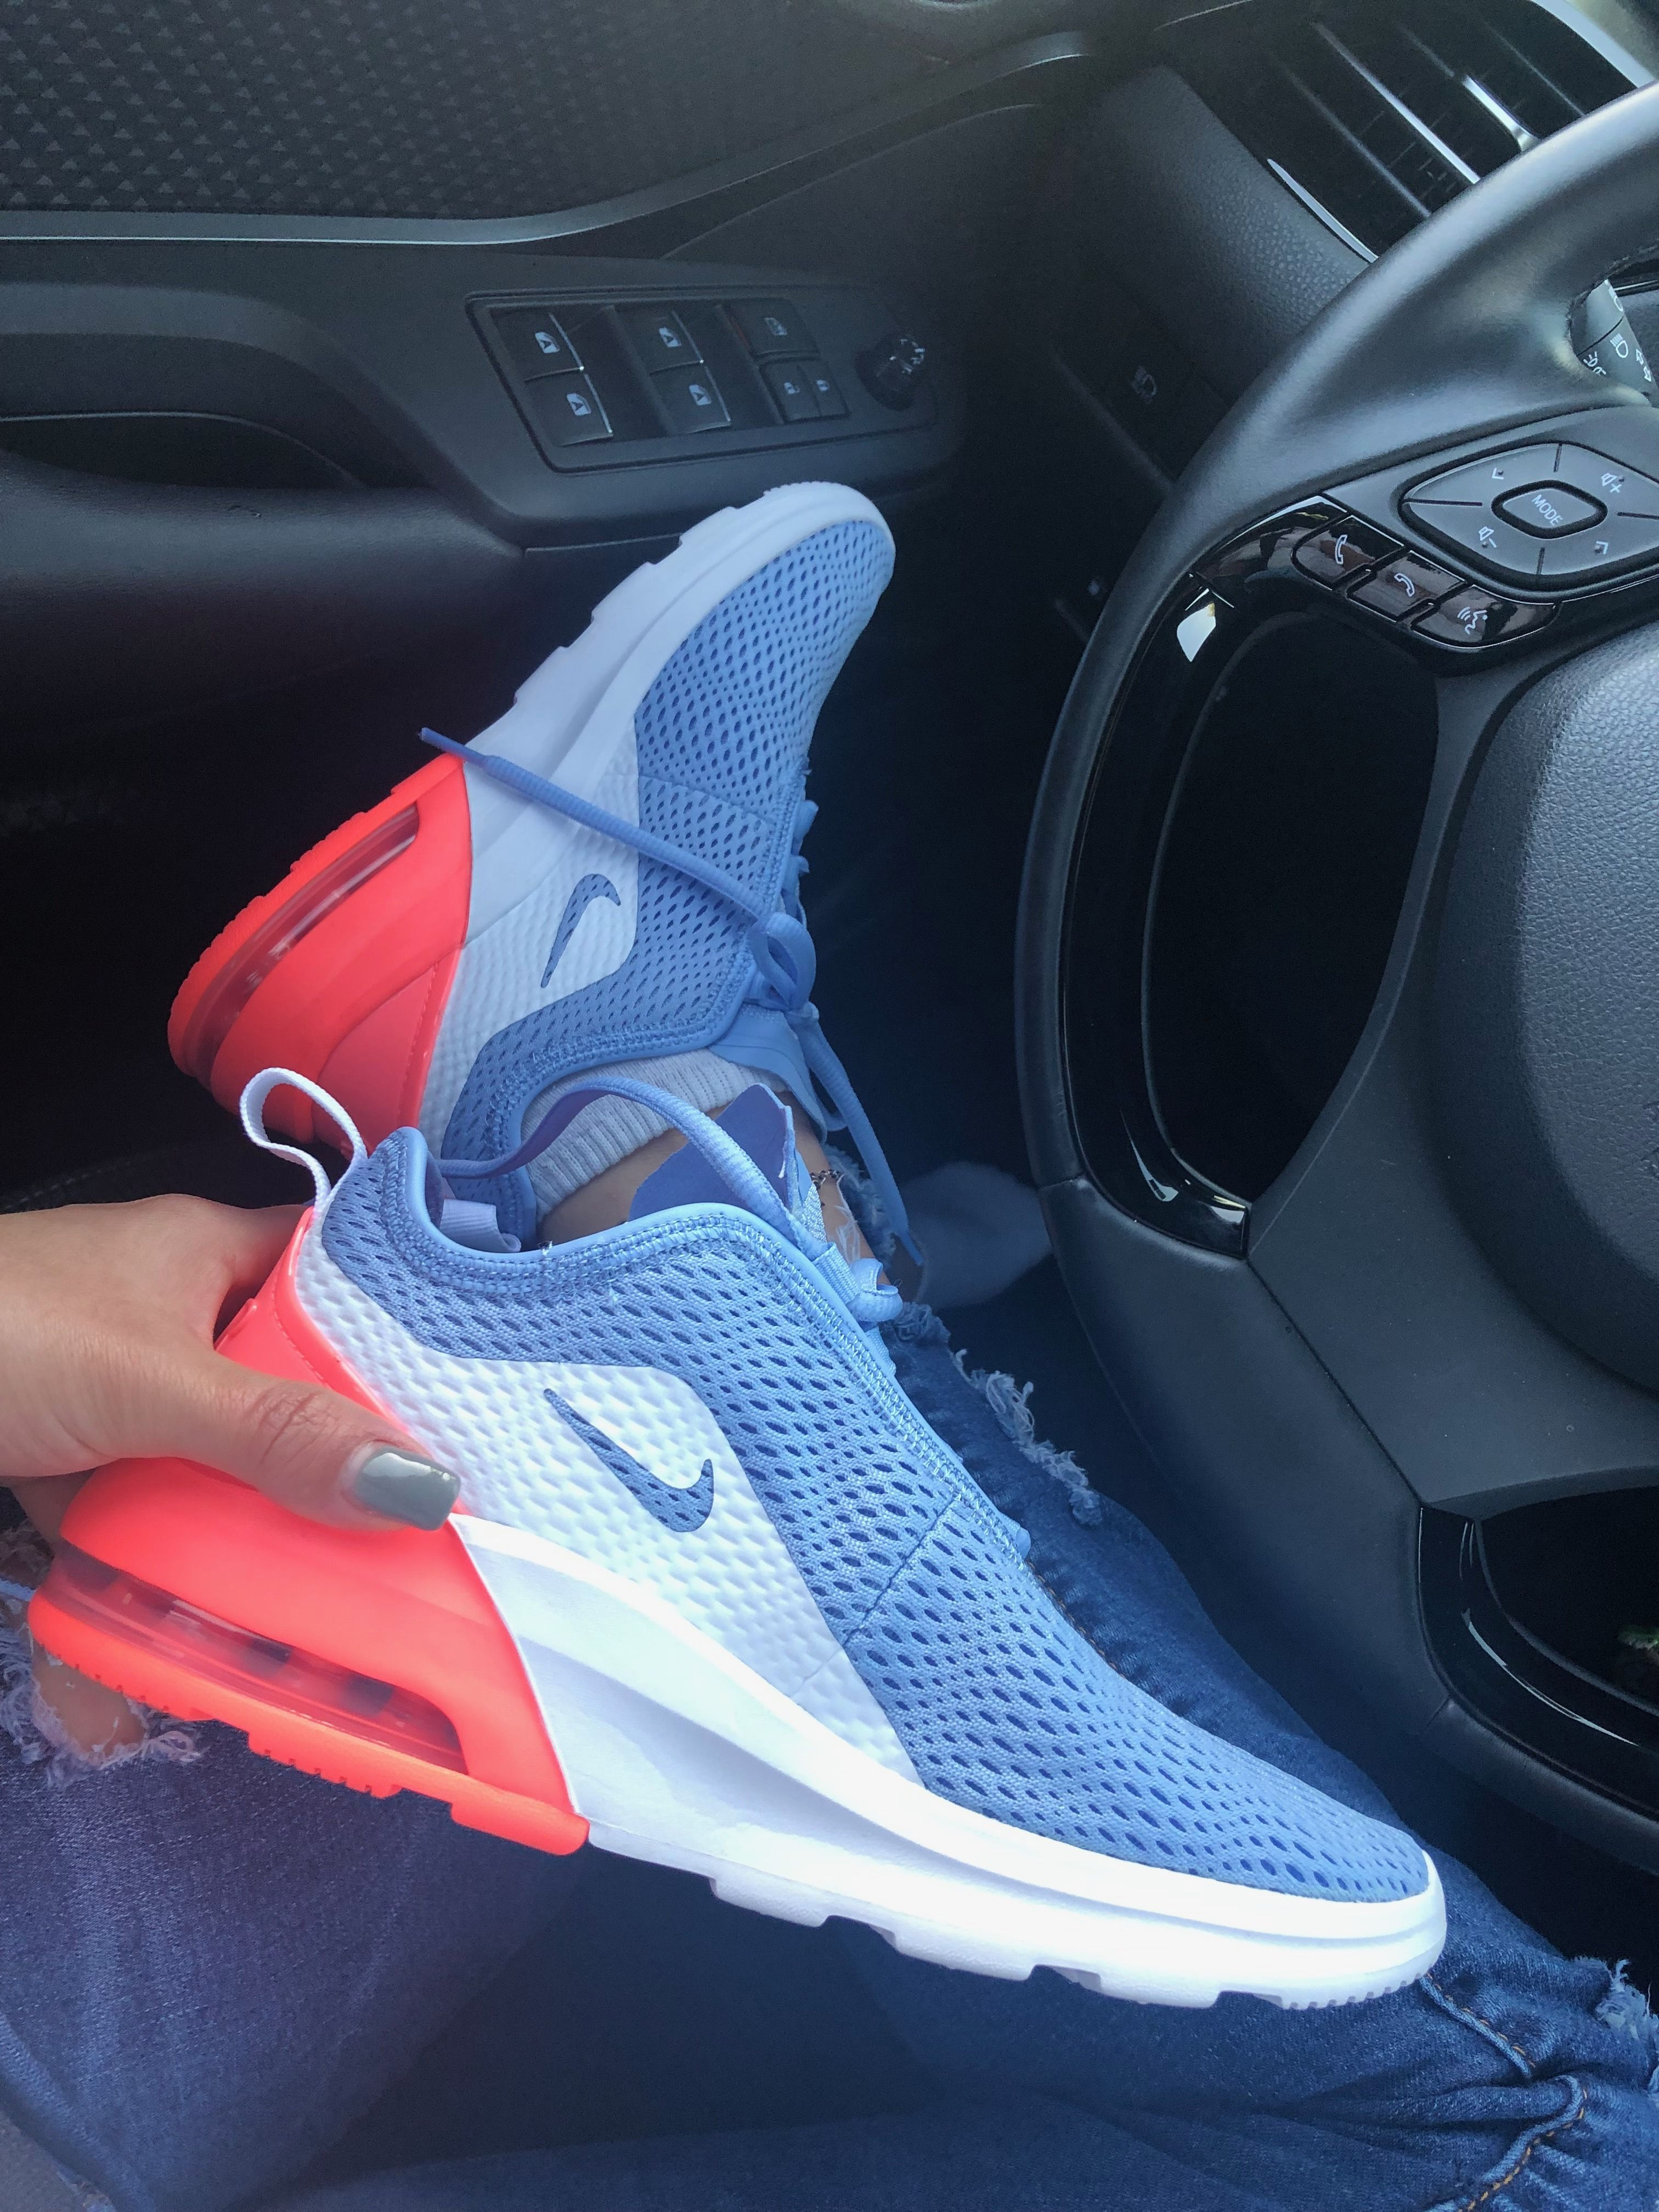 promedio cama tsunami  Nike air max motion 2 | Nike, Sport shoes, Nike air max